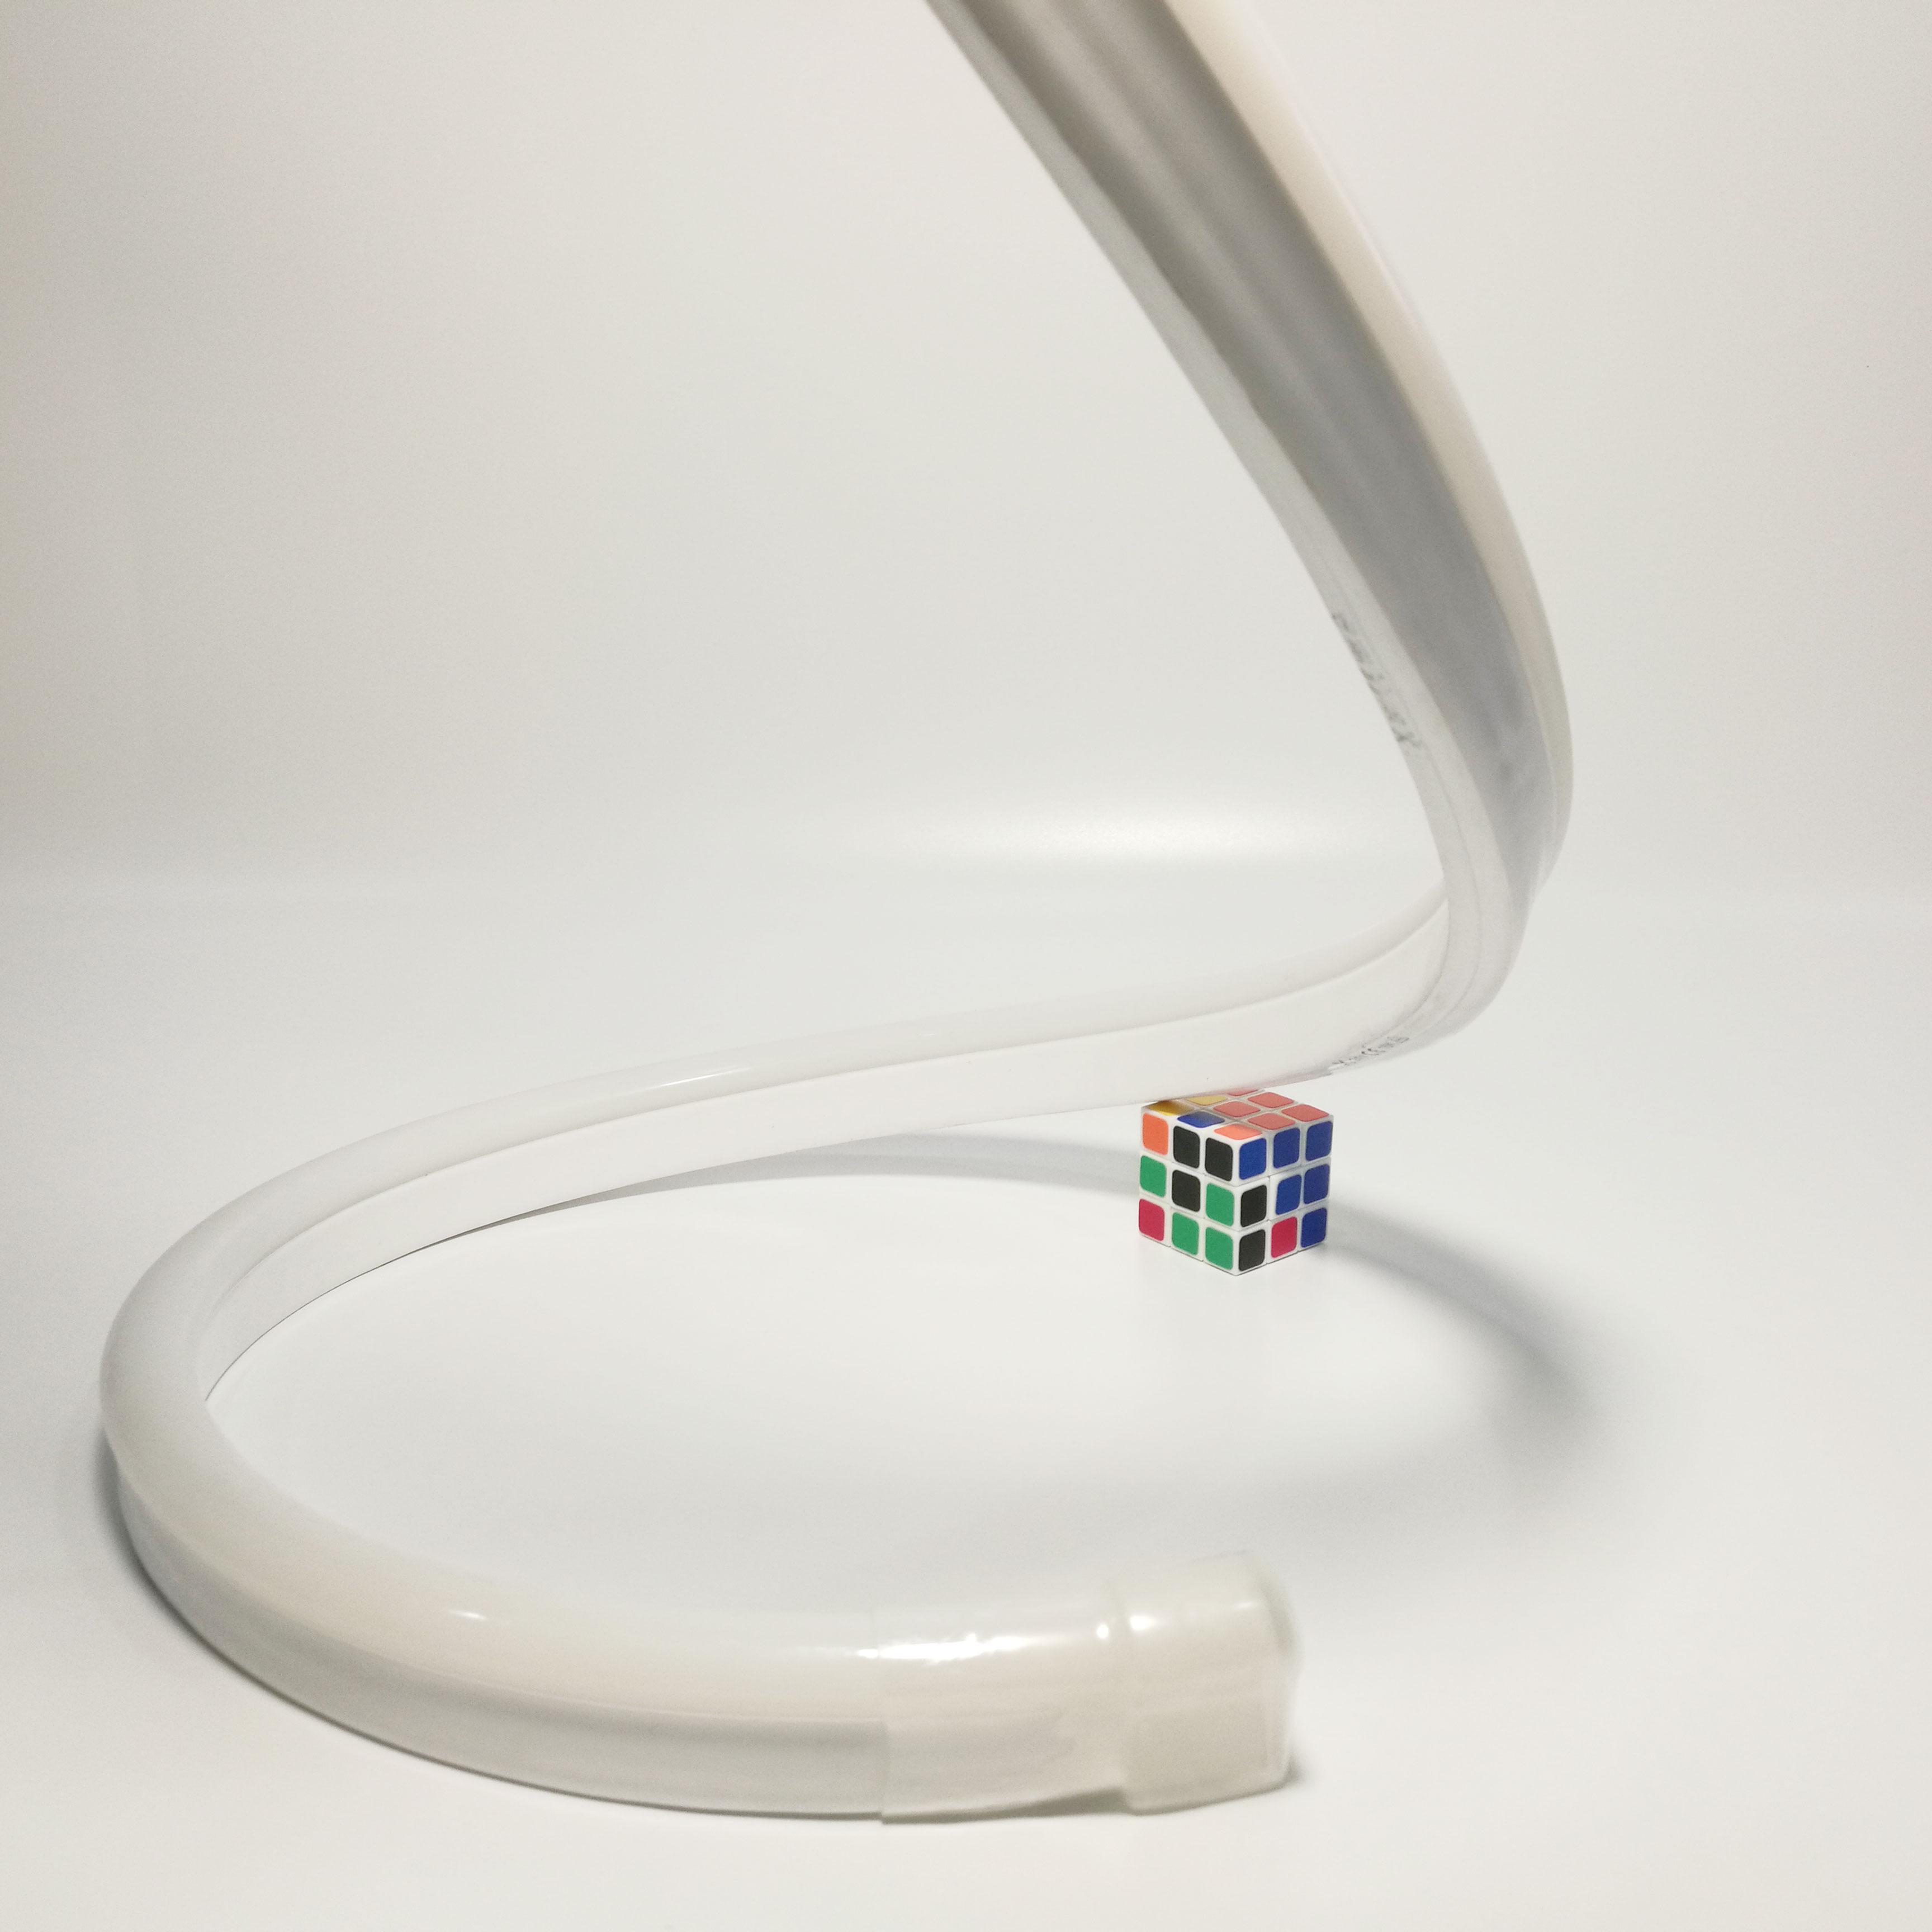 domed shape led neon flex led neon flex neon flex. Black Bedroom Furniture Sets. Home Design Ideas